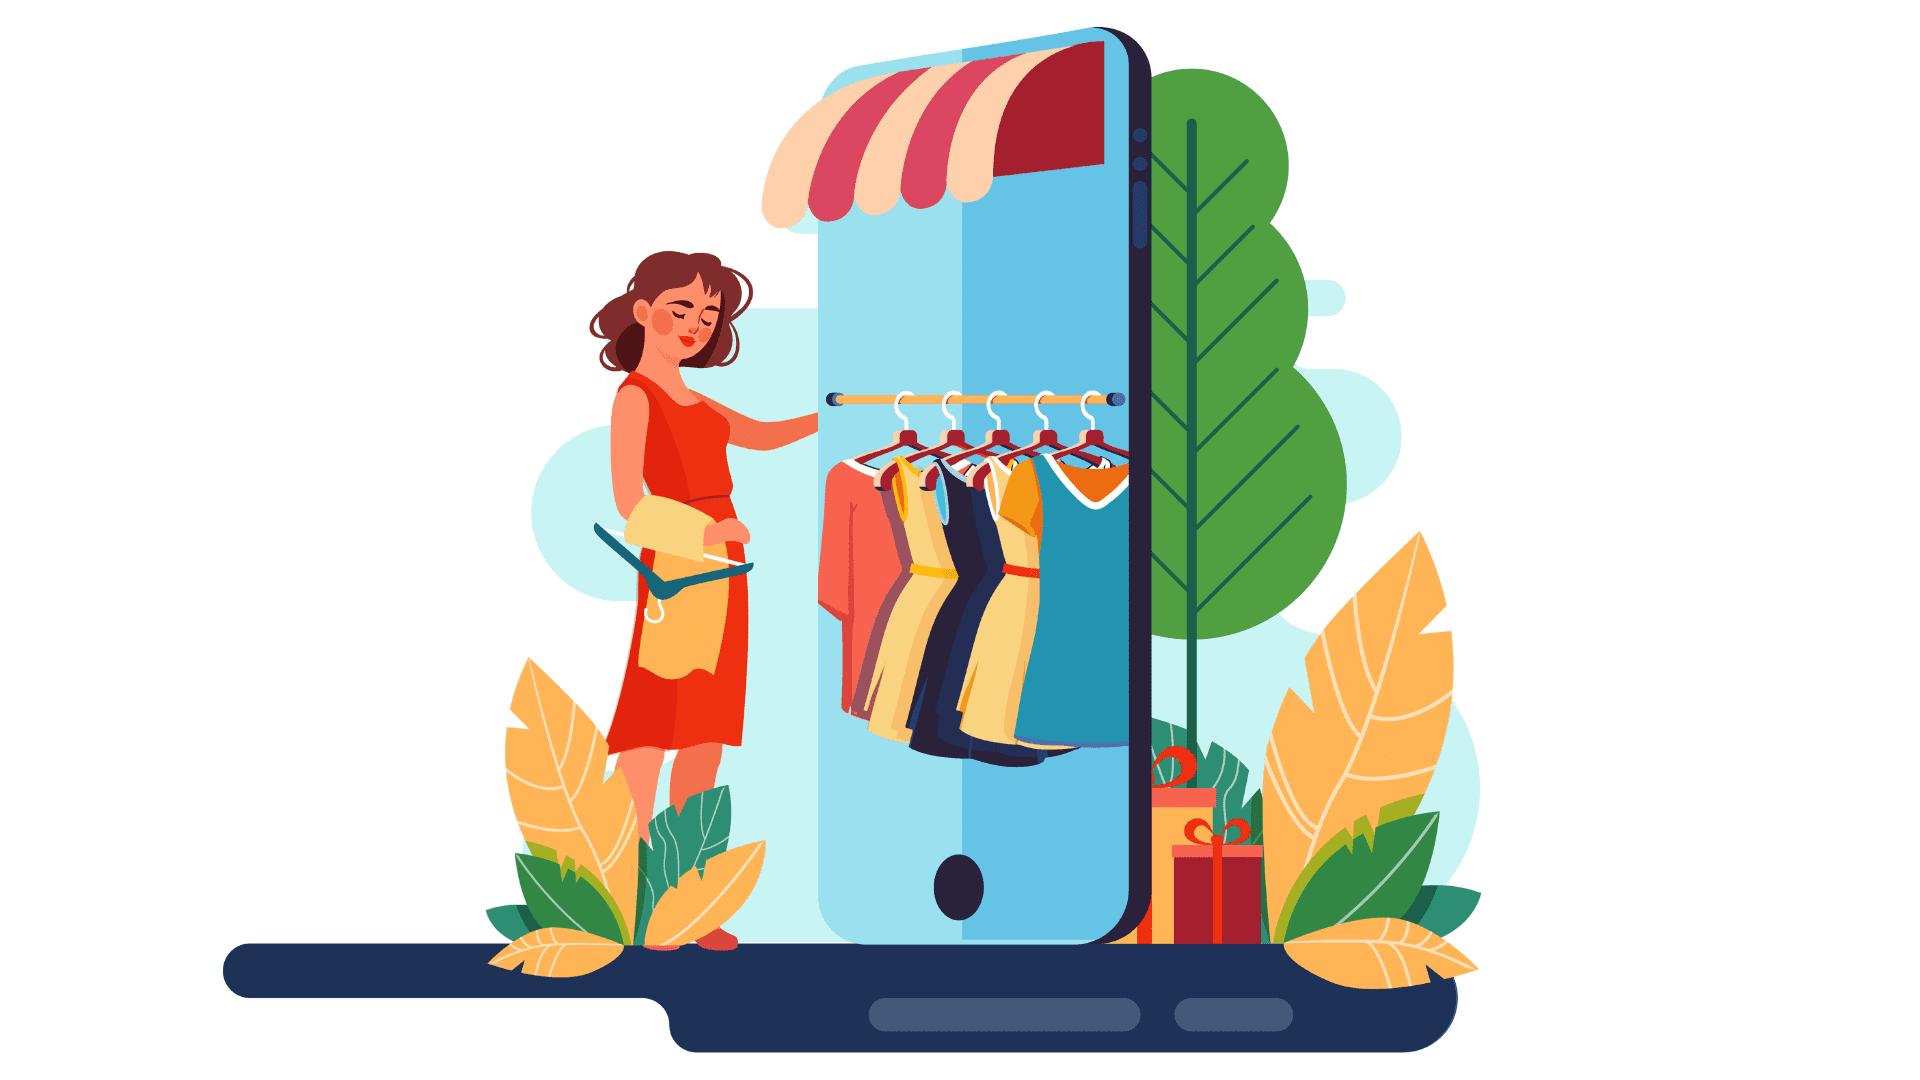 Customers explore the app